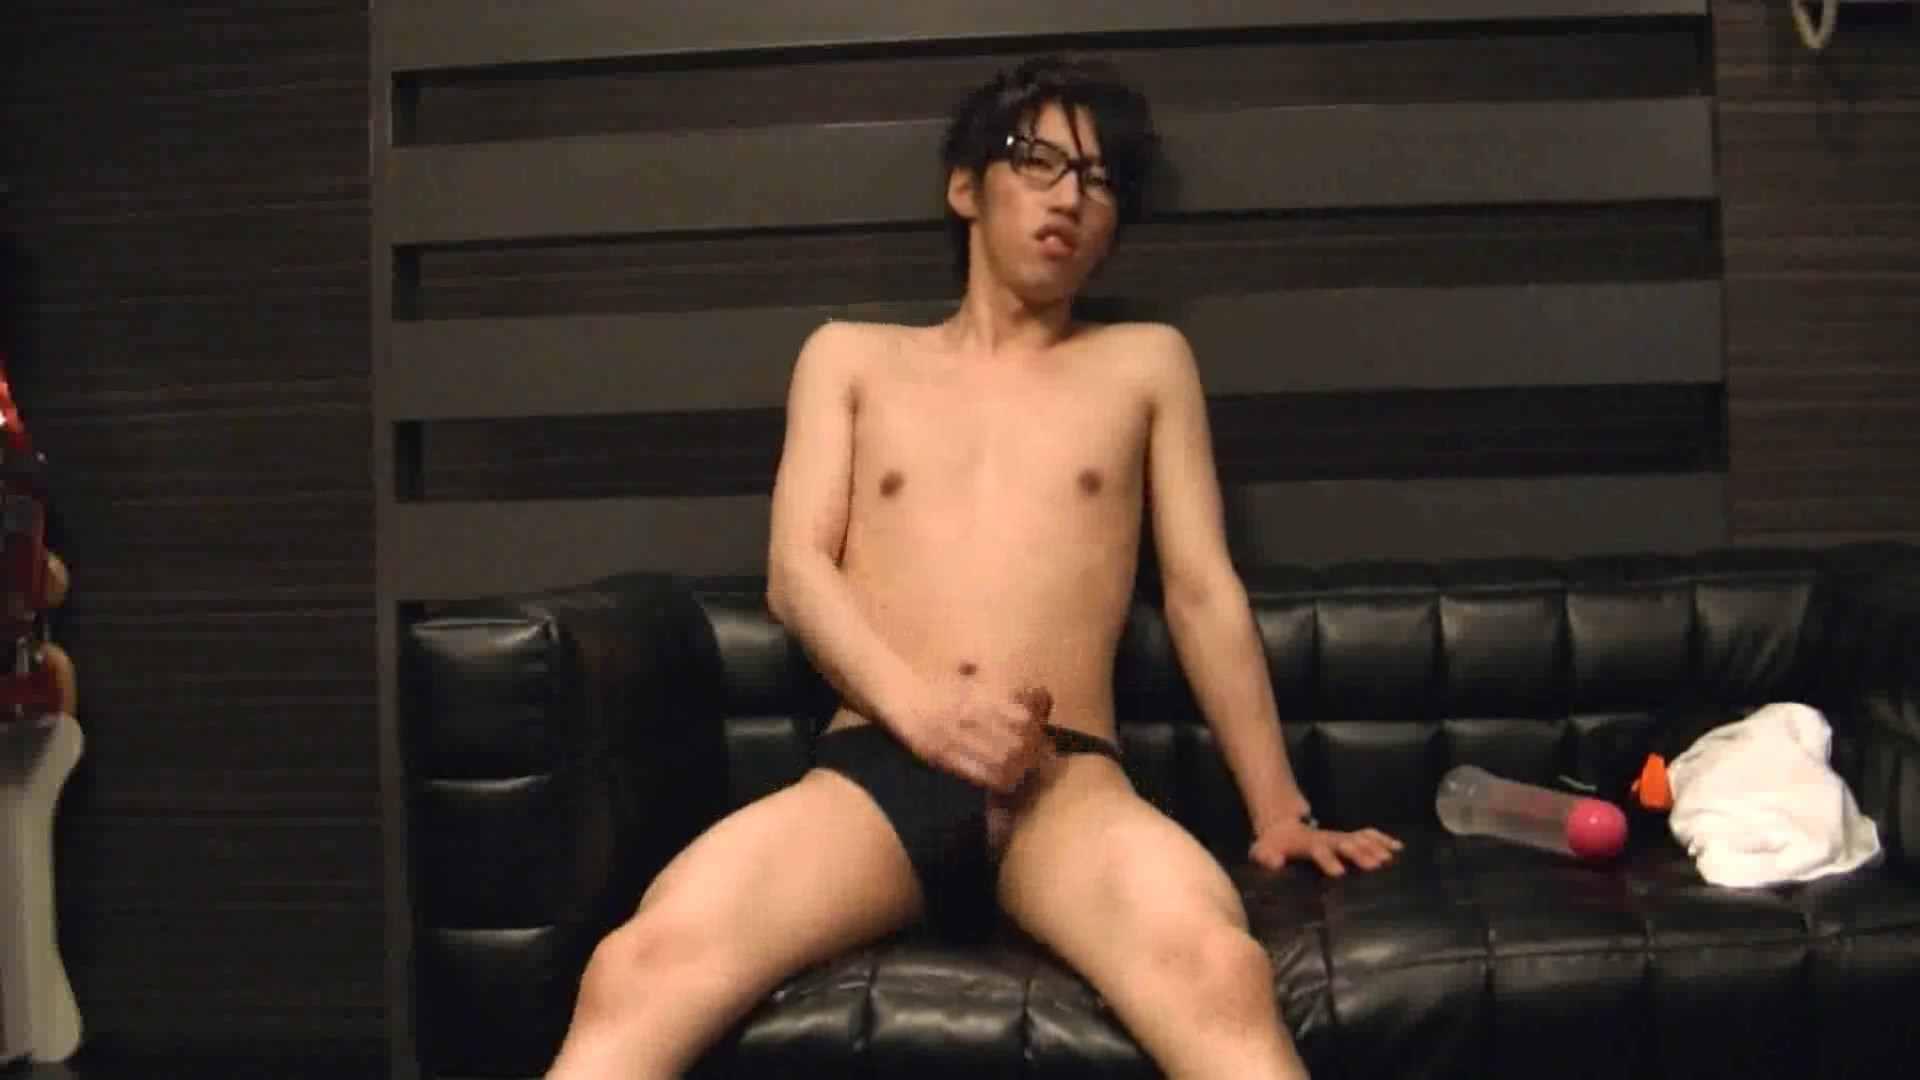 ONA見せカーニバル!! Vol3 男  93pic 60